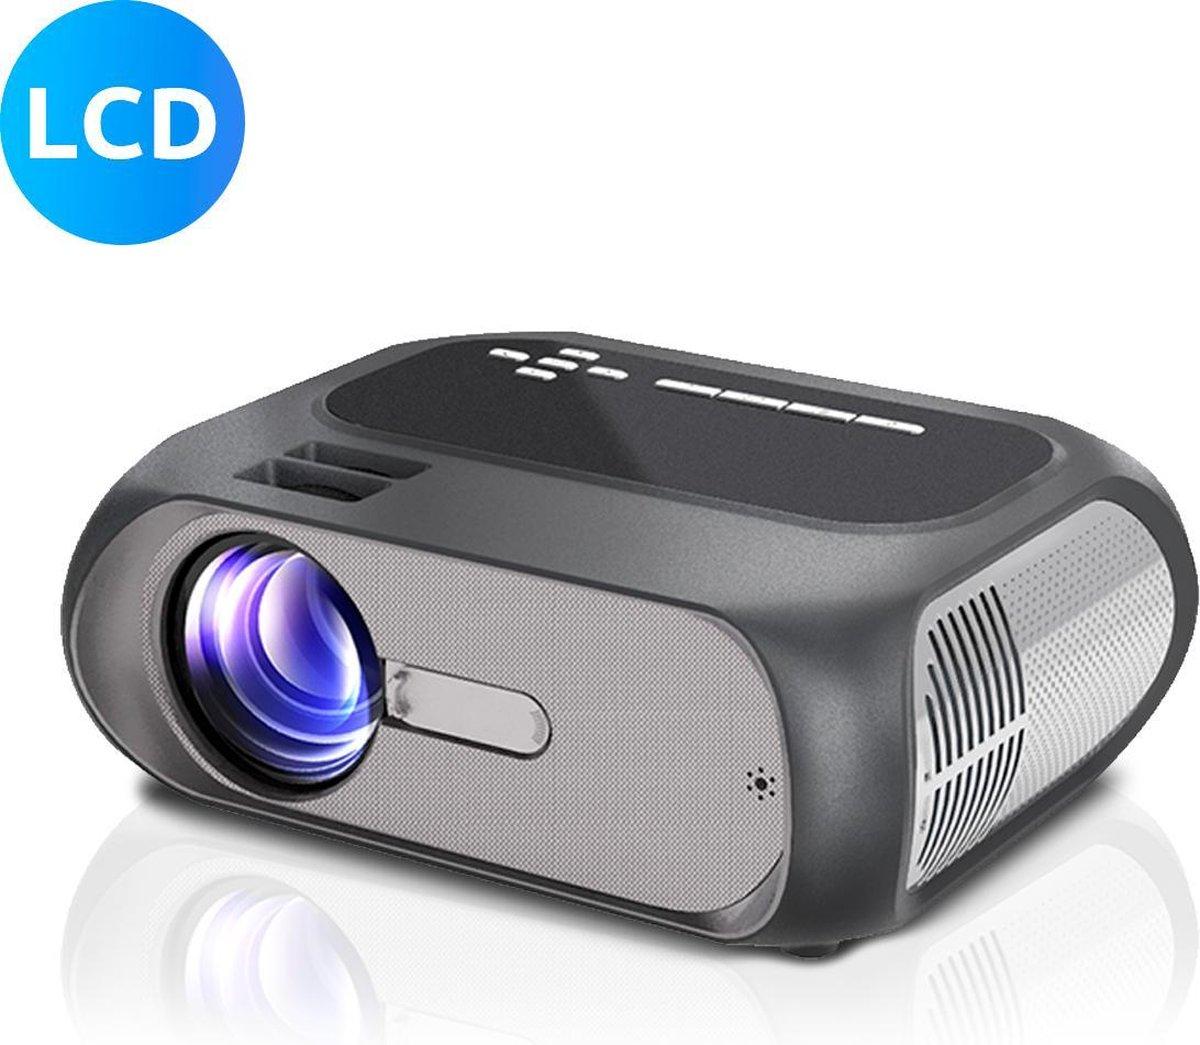 Dailygoods Mini Beamer – HD – Beamer Projector- HDMI – WiFi - 5000 Lumen